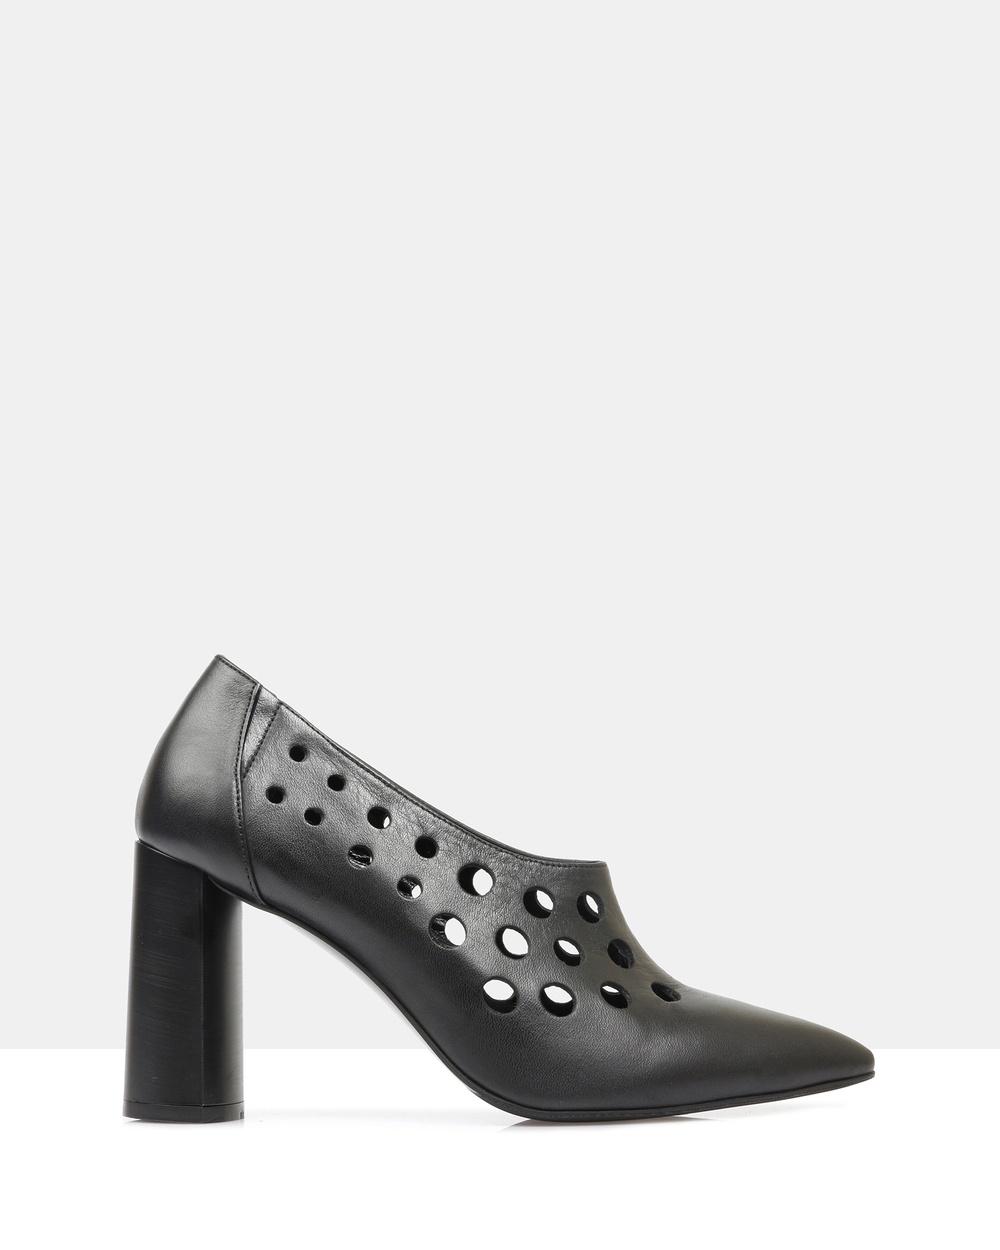 Sempre Di Imiza Heels Heels 901- 54 Black Imiza Heels